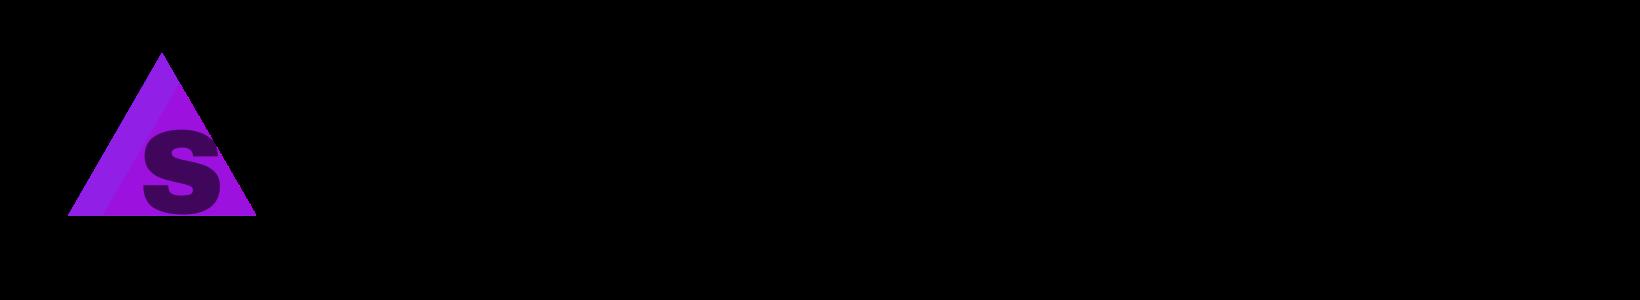 AAS Accreditation Logo